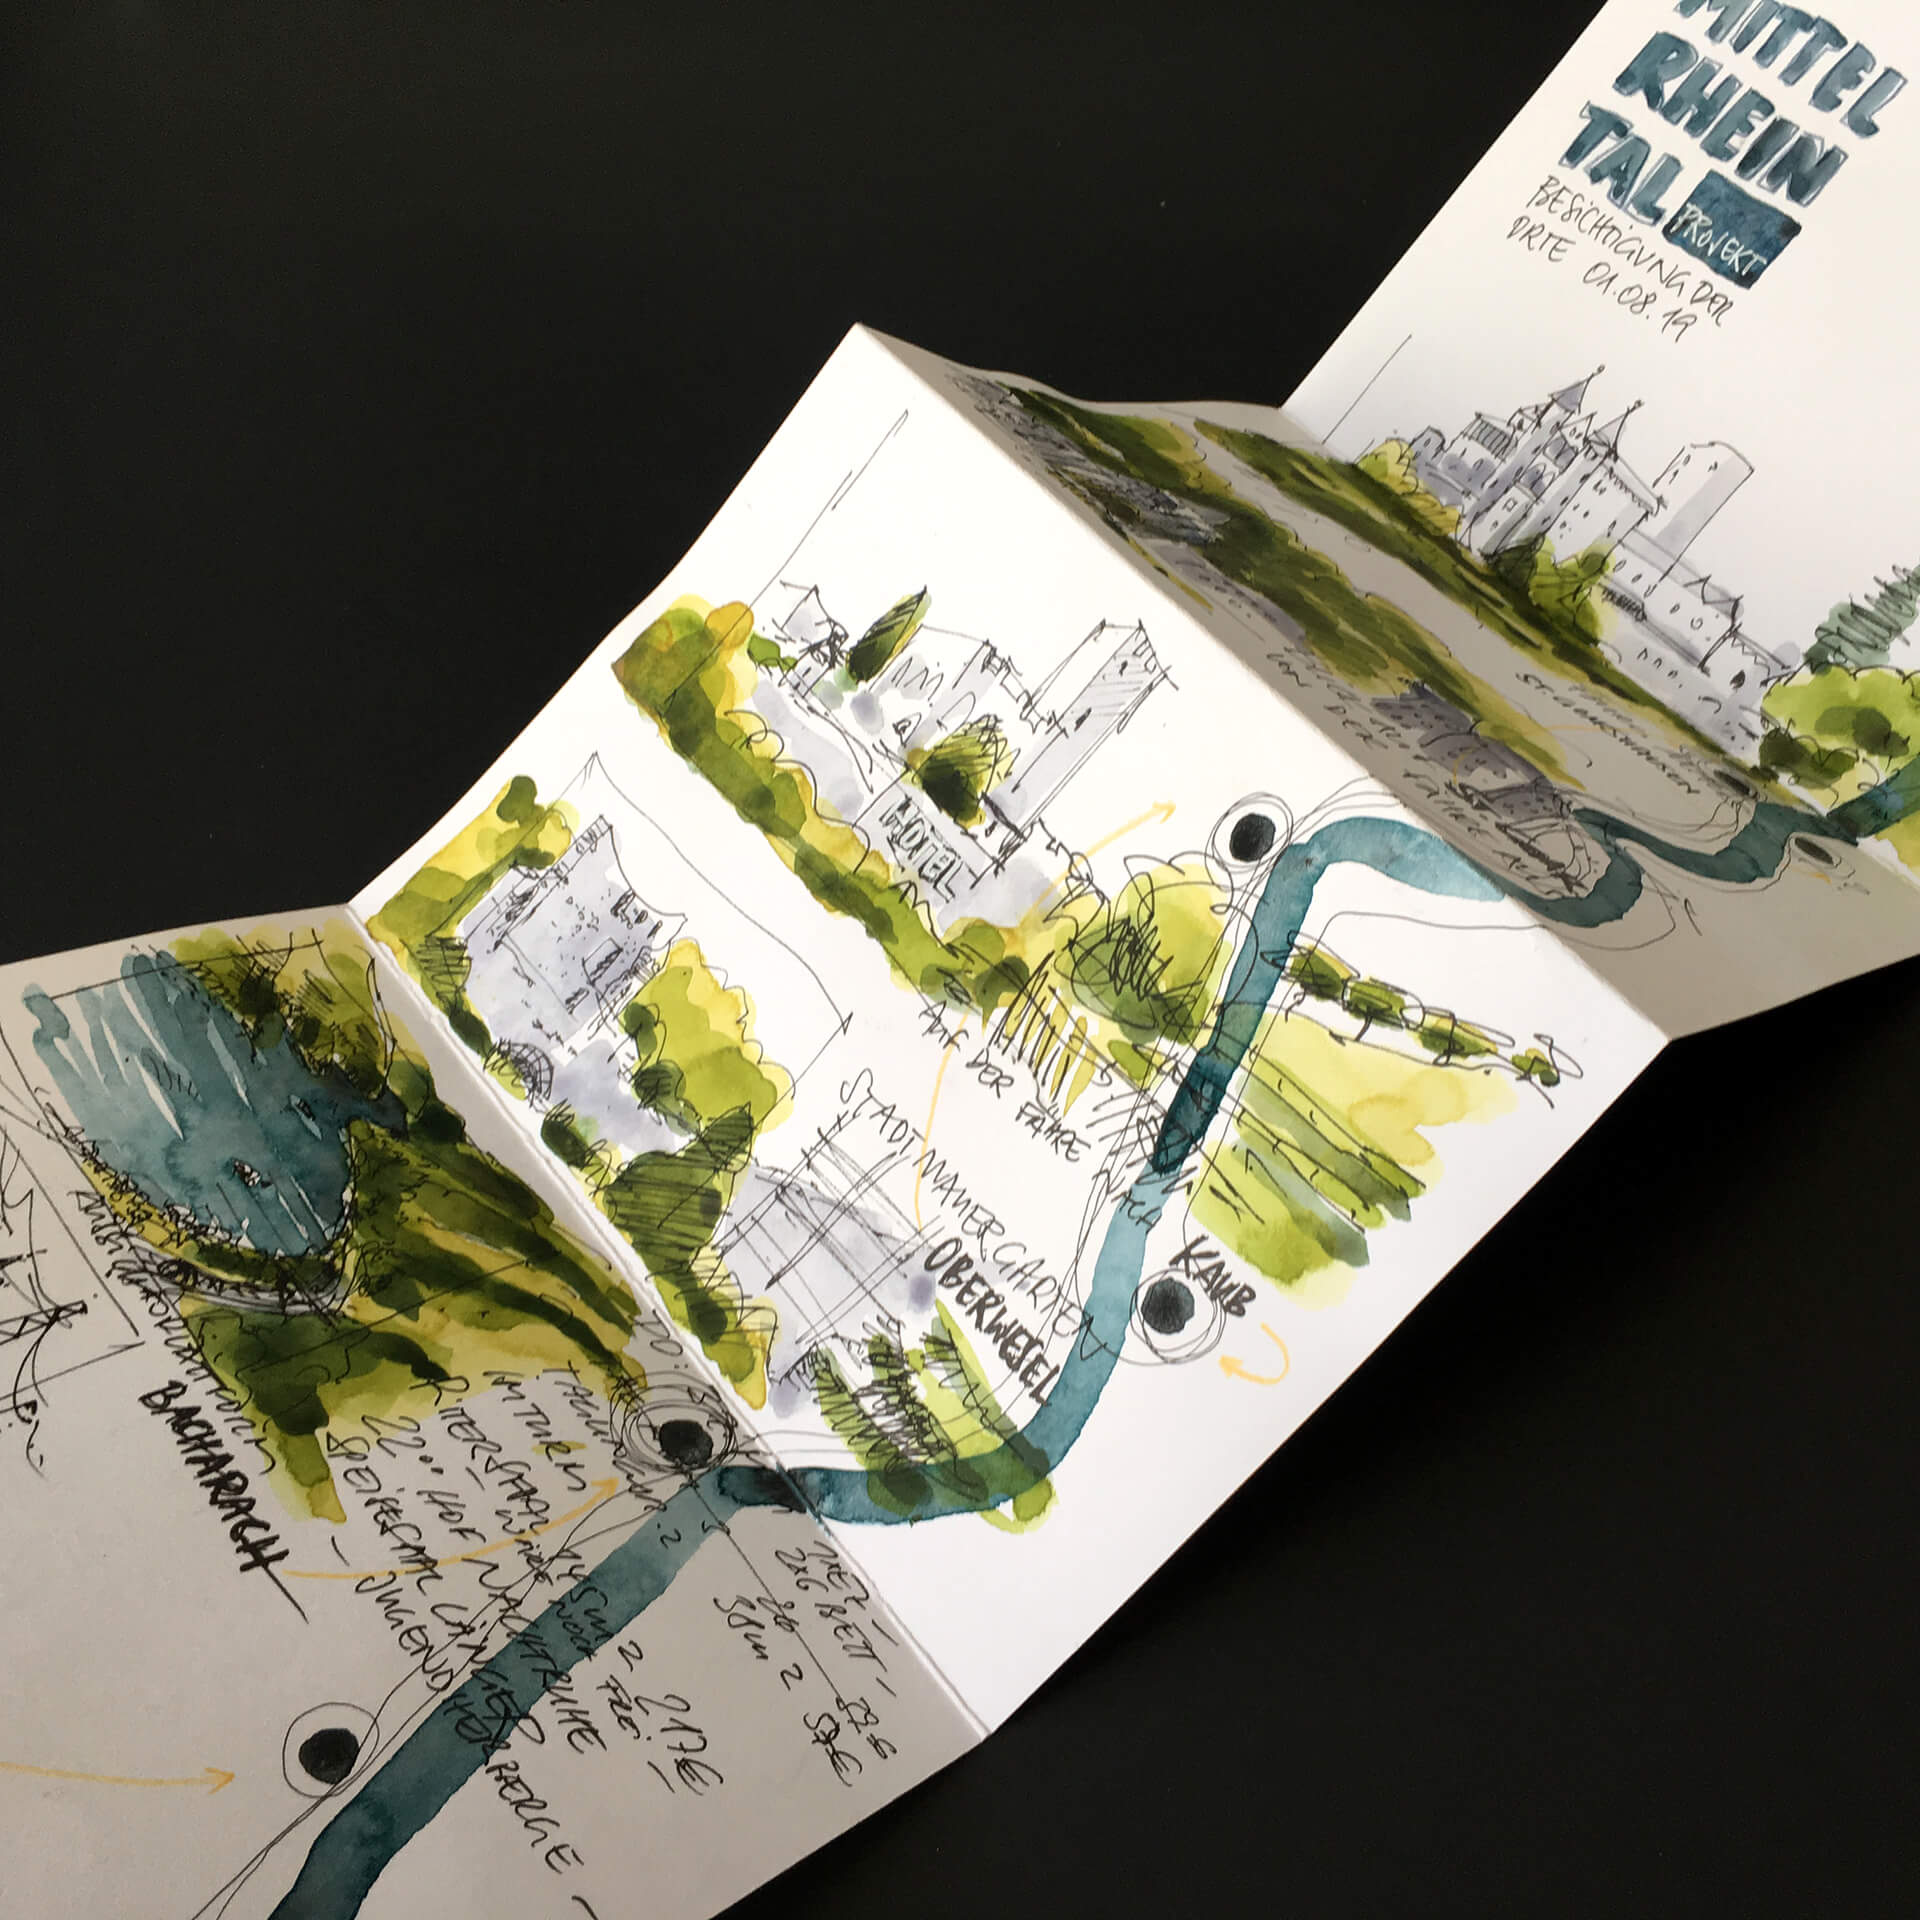 Konzeption Planung Ausstellungen Kunstevents Urban Sketching Storytelling